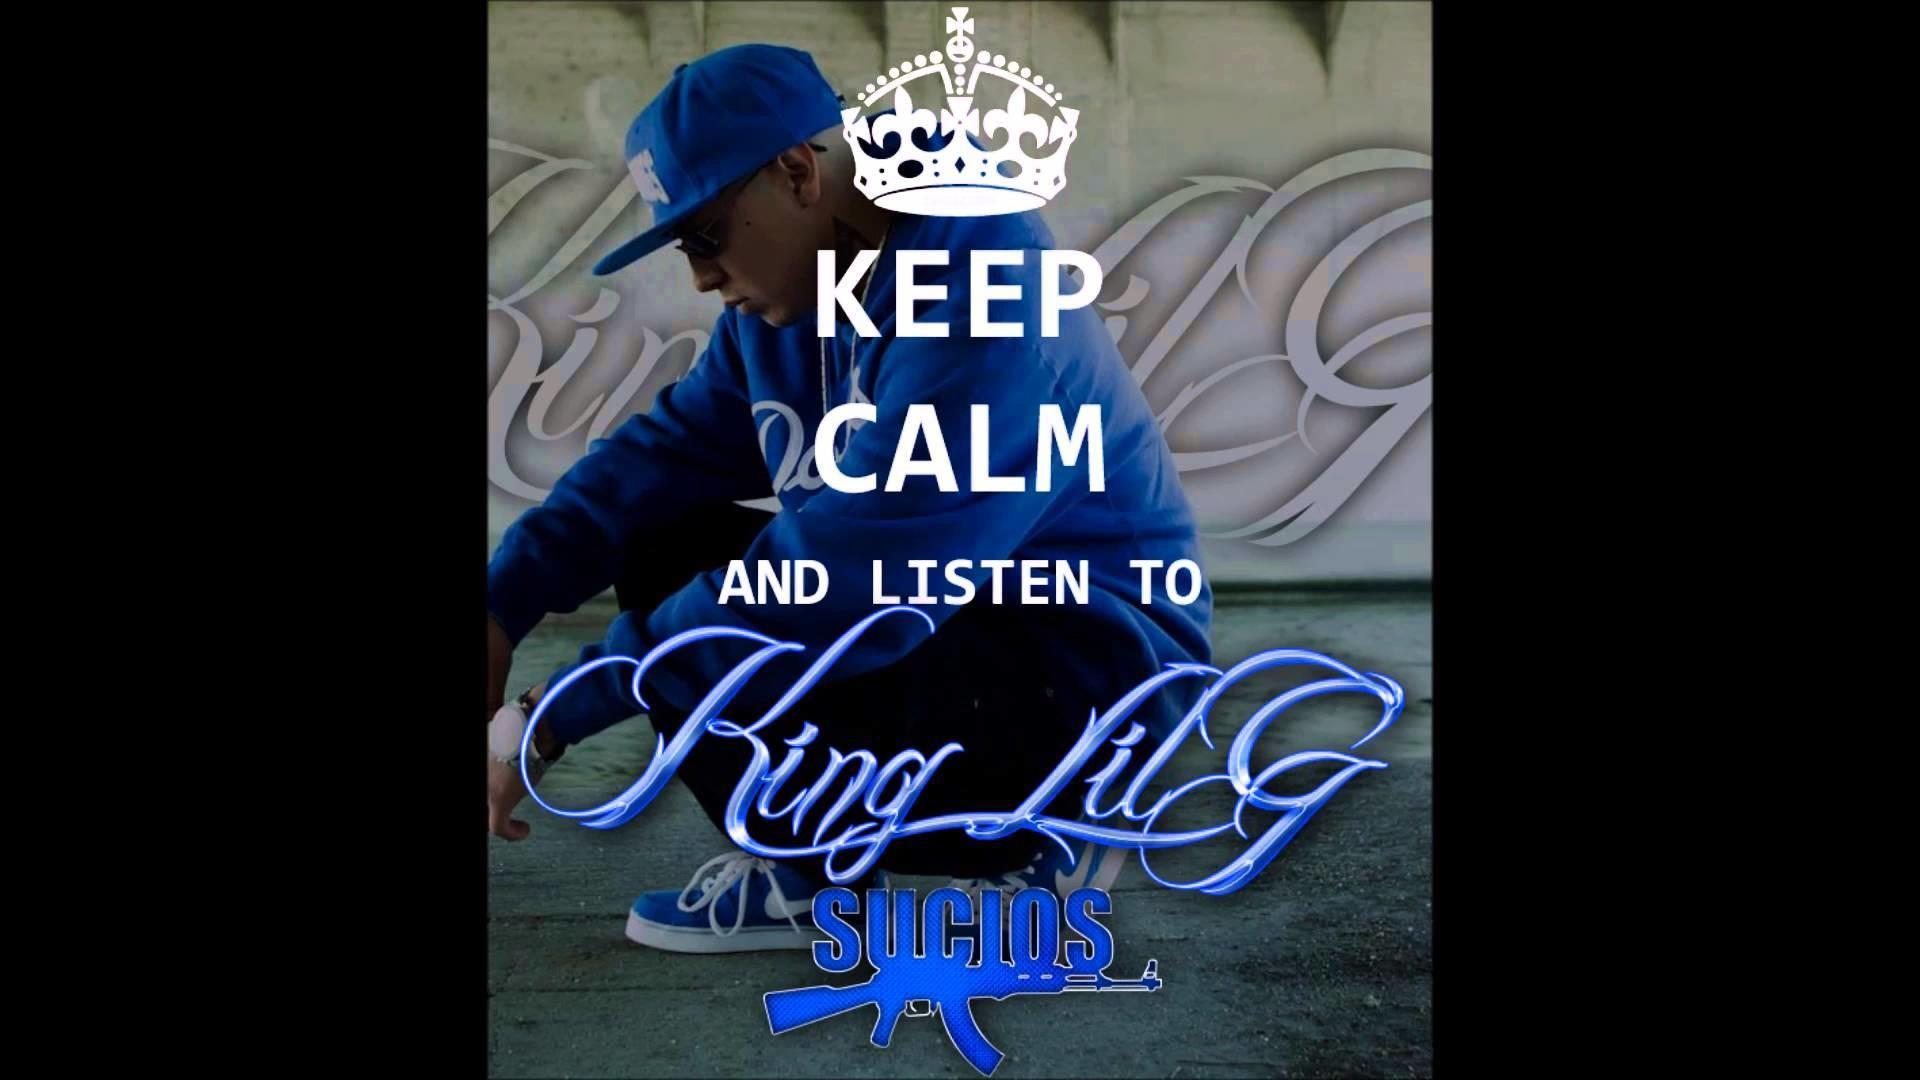 … Best 4K Wallpaper King Lil G Wallpaper in A Message From King Lil G  YouTube 4K